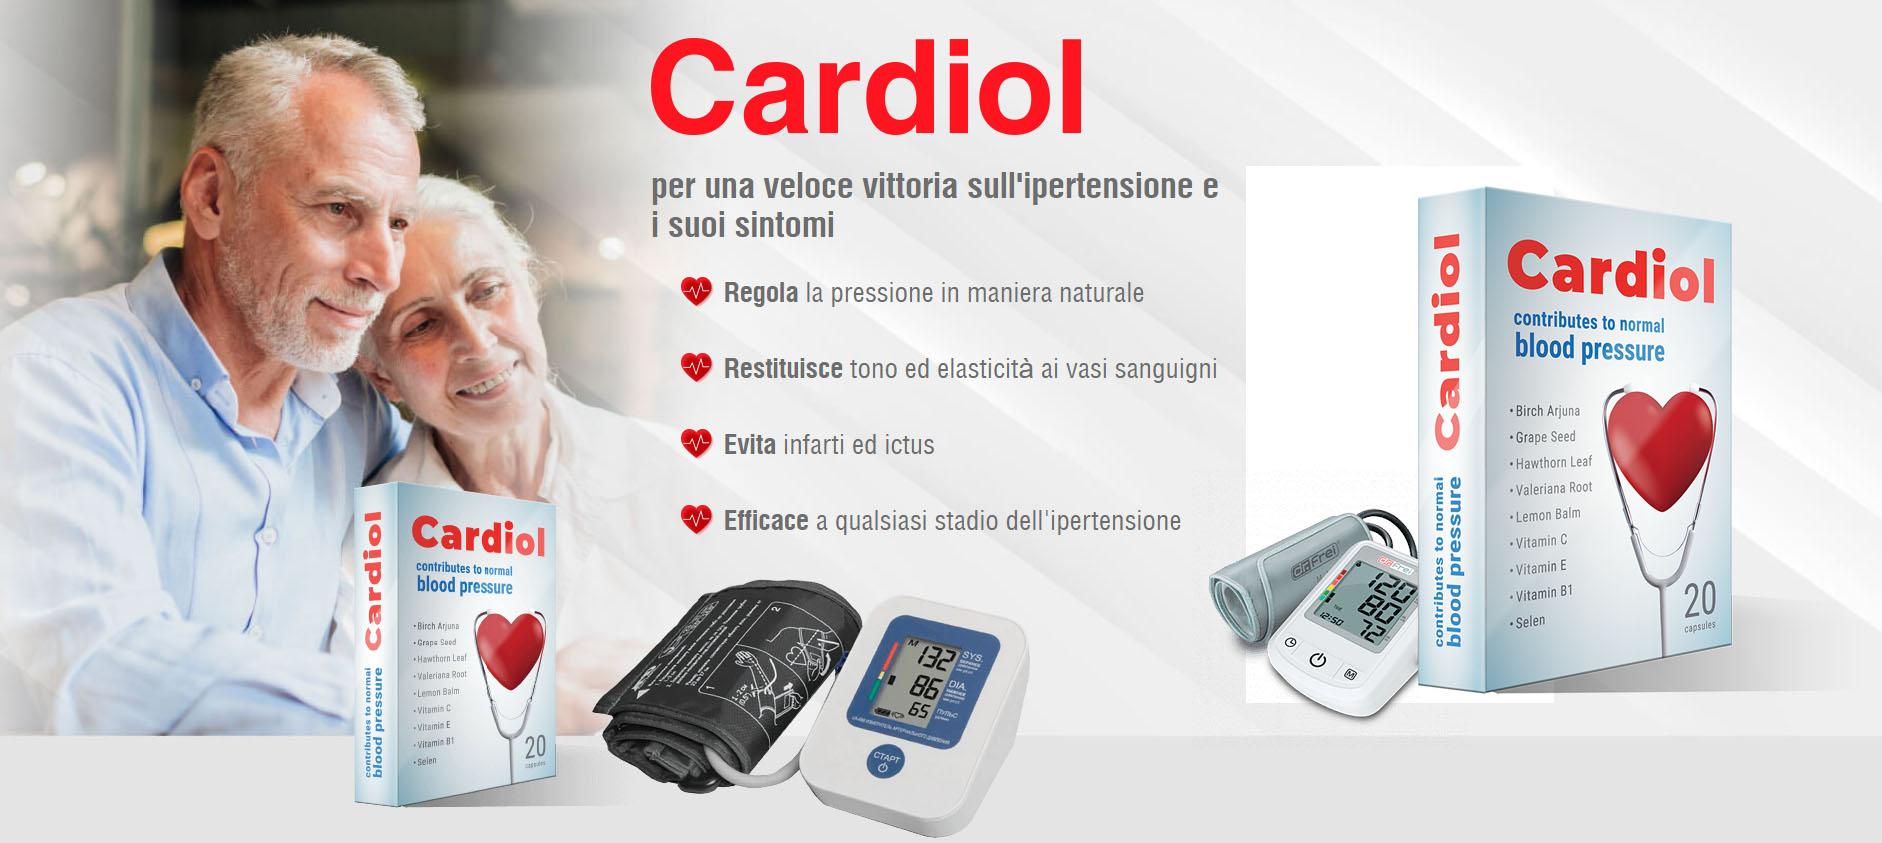 cardiol integratore